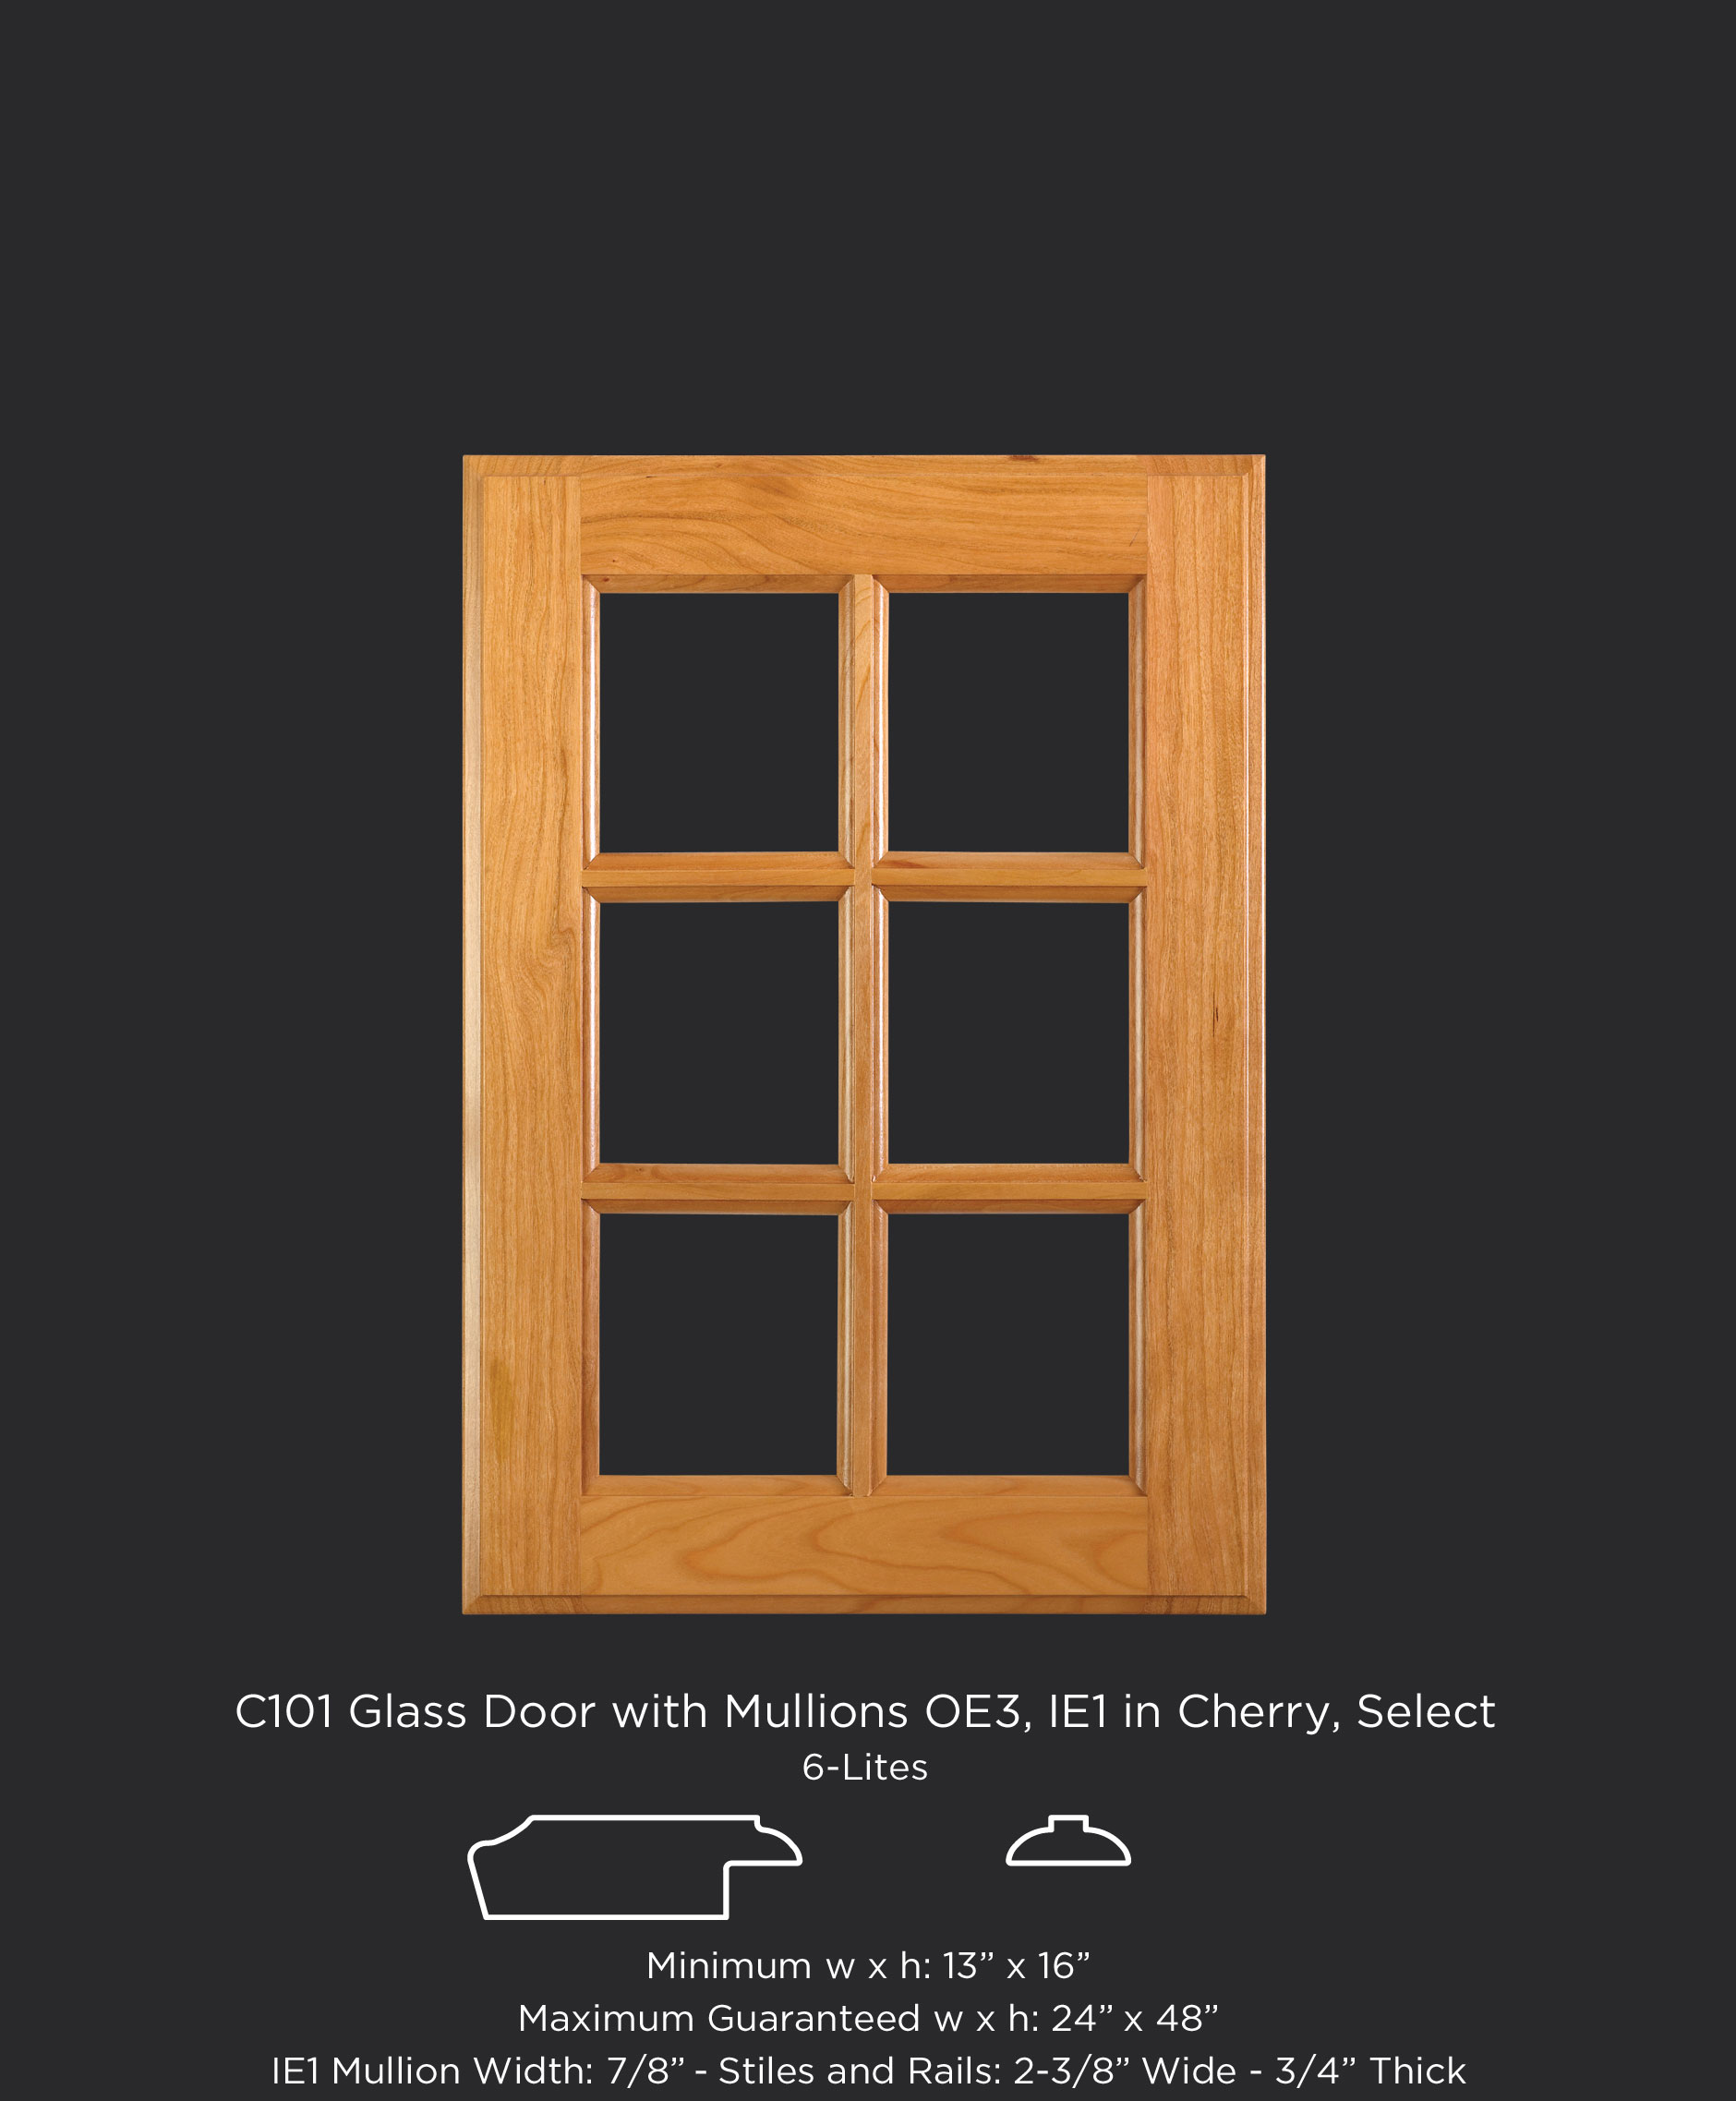 2275 #A66525 Radius Top 8 Lites OE5 IE1 – Walnut Select wallpaper Radius Top Entry Doors 38951880